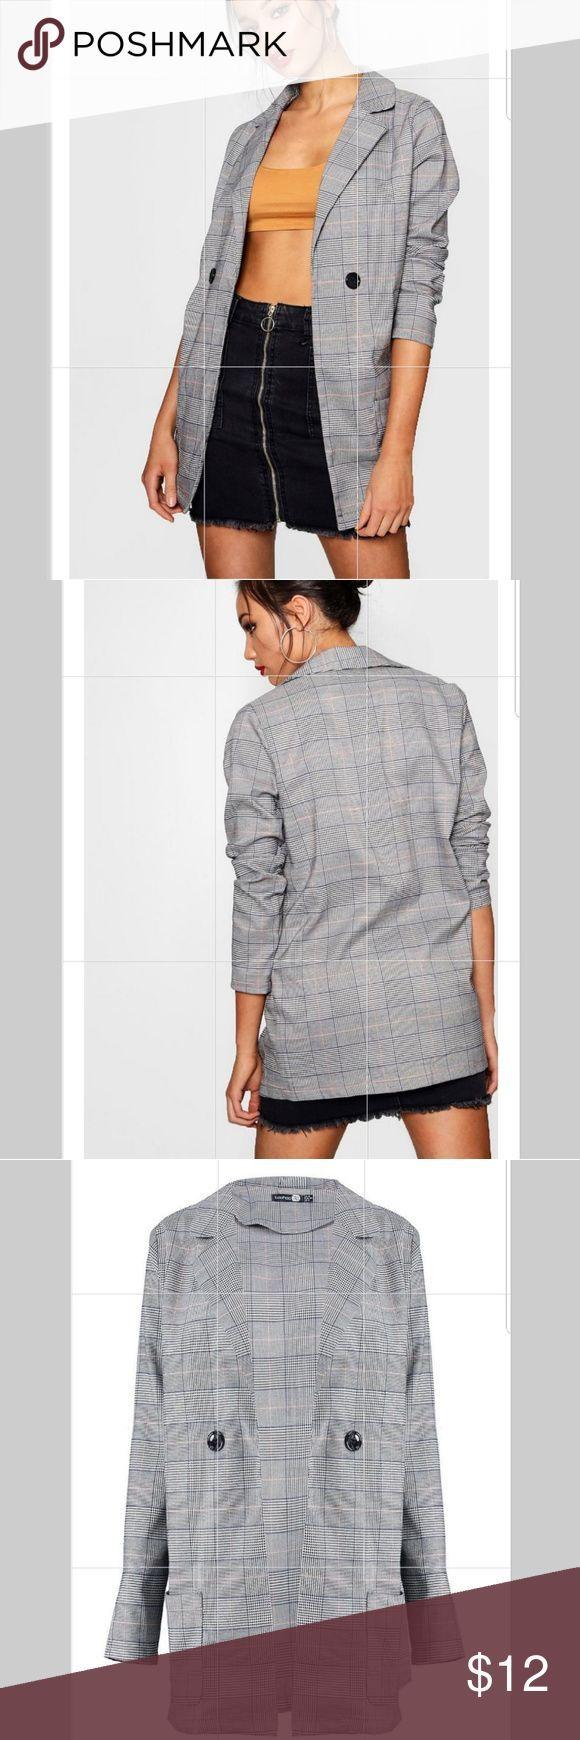 Boohoo tall boyfriend blazer Size 4, net, love! Boohoo Jackets & Coats Blazers